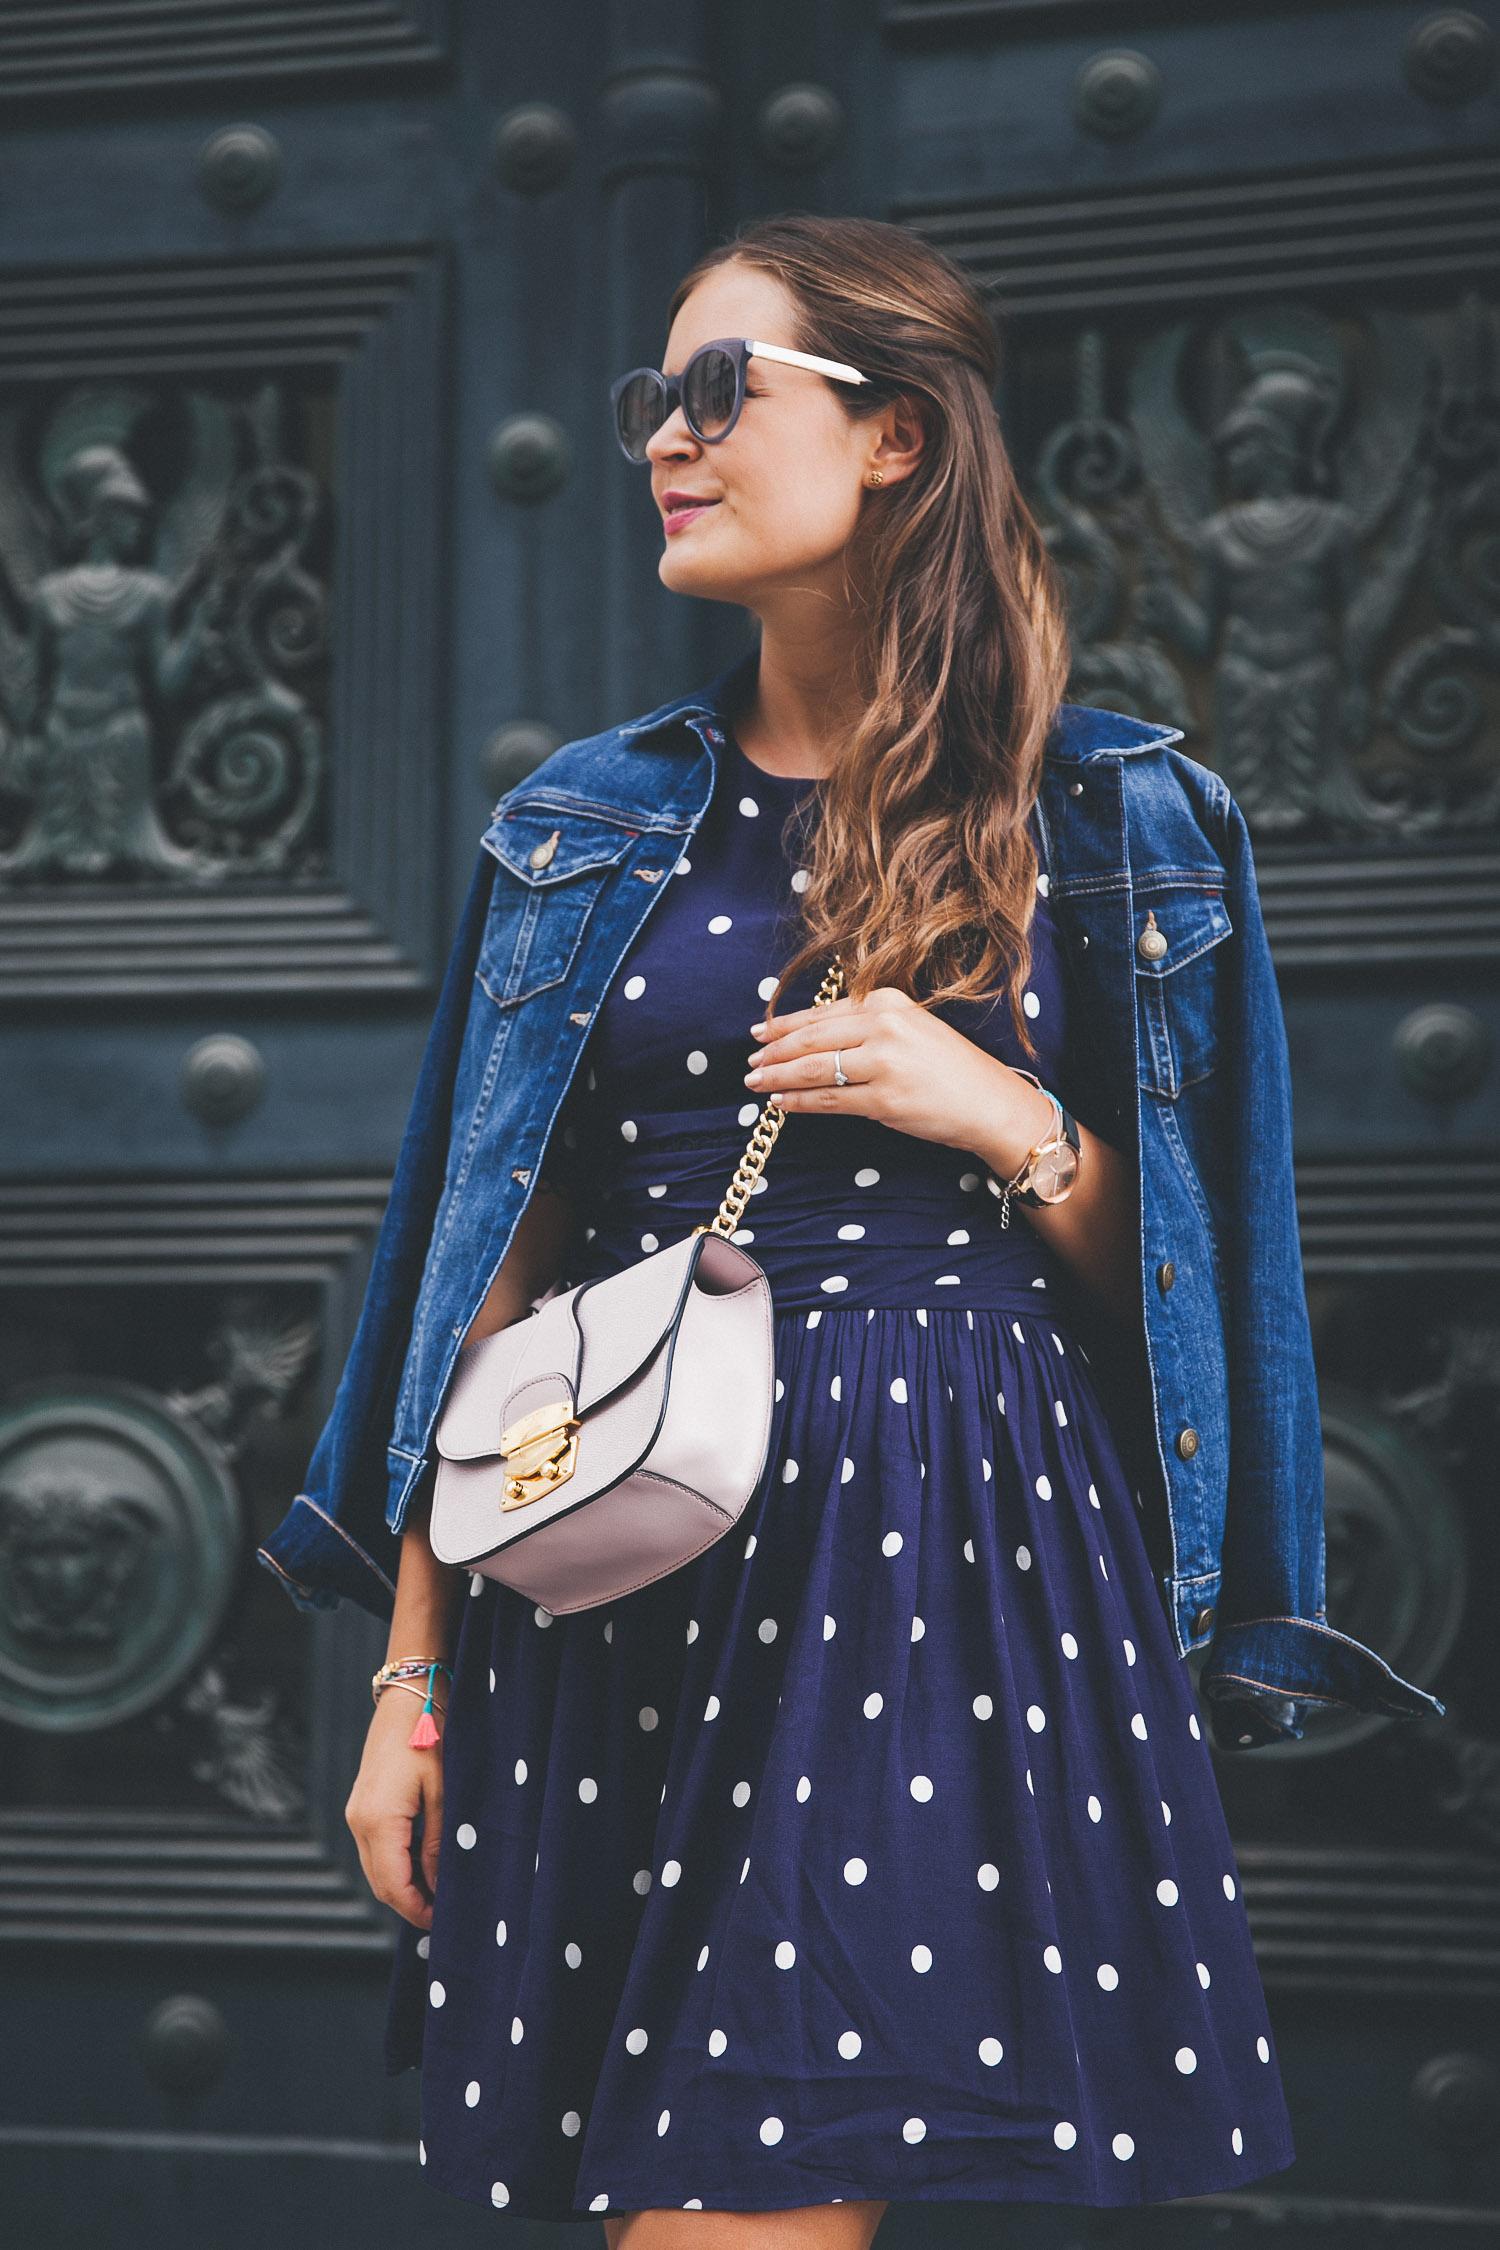 Blaues kleid mit jeansjacke